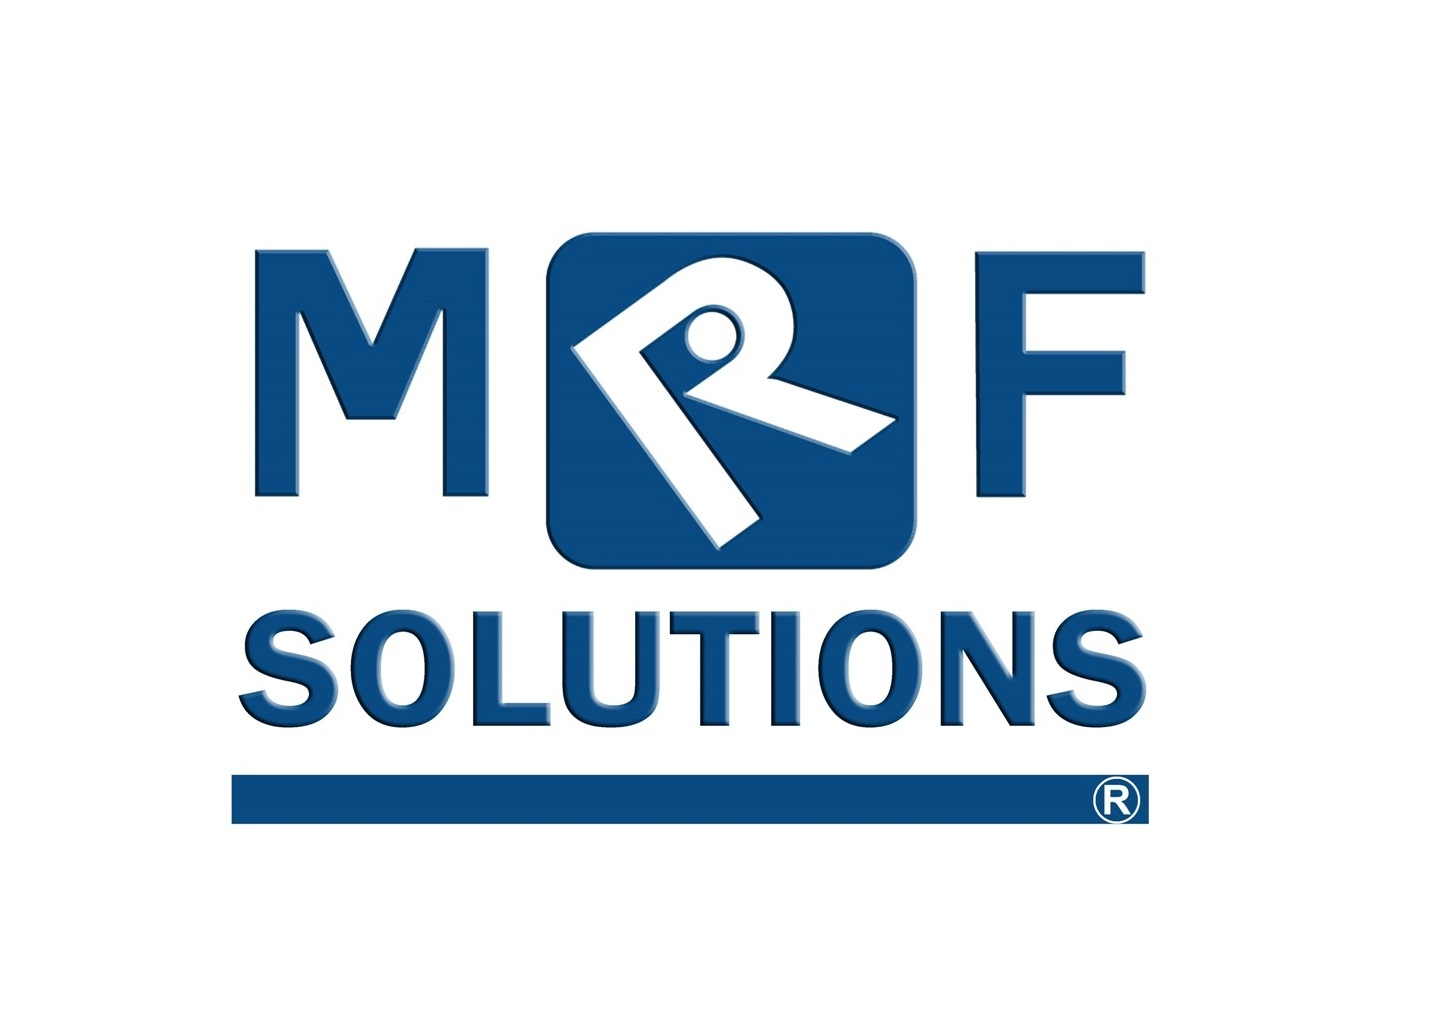 Mecanizados Rodríguez Fernández, S.L. (MRF)